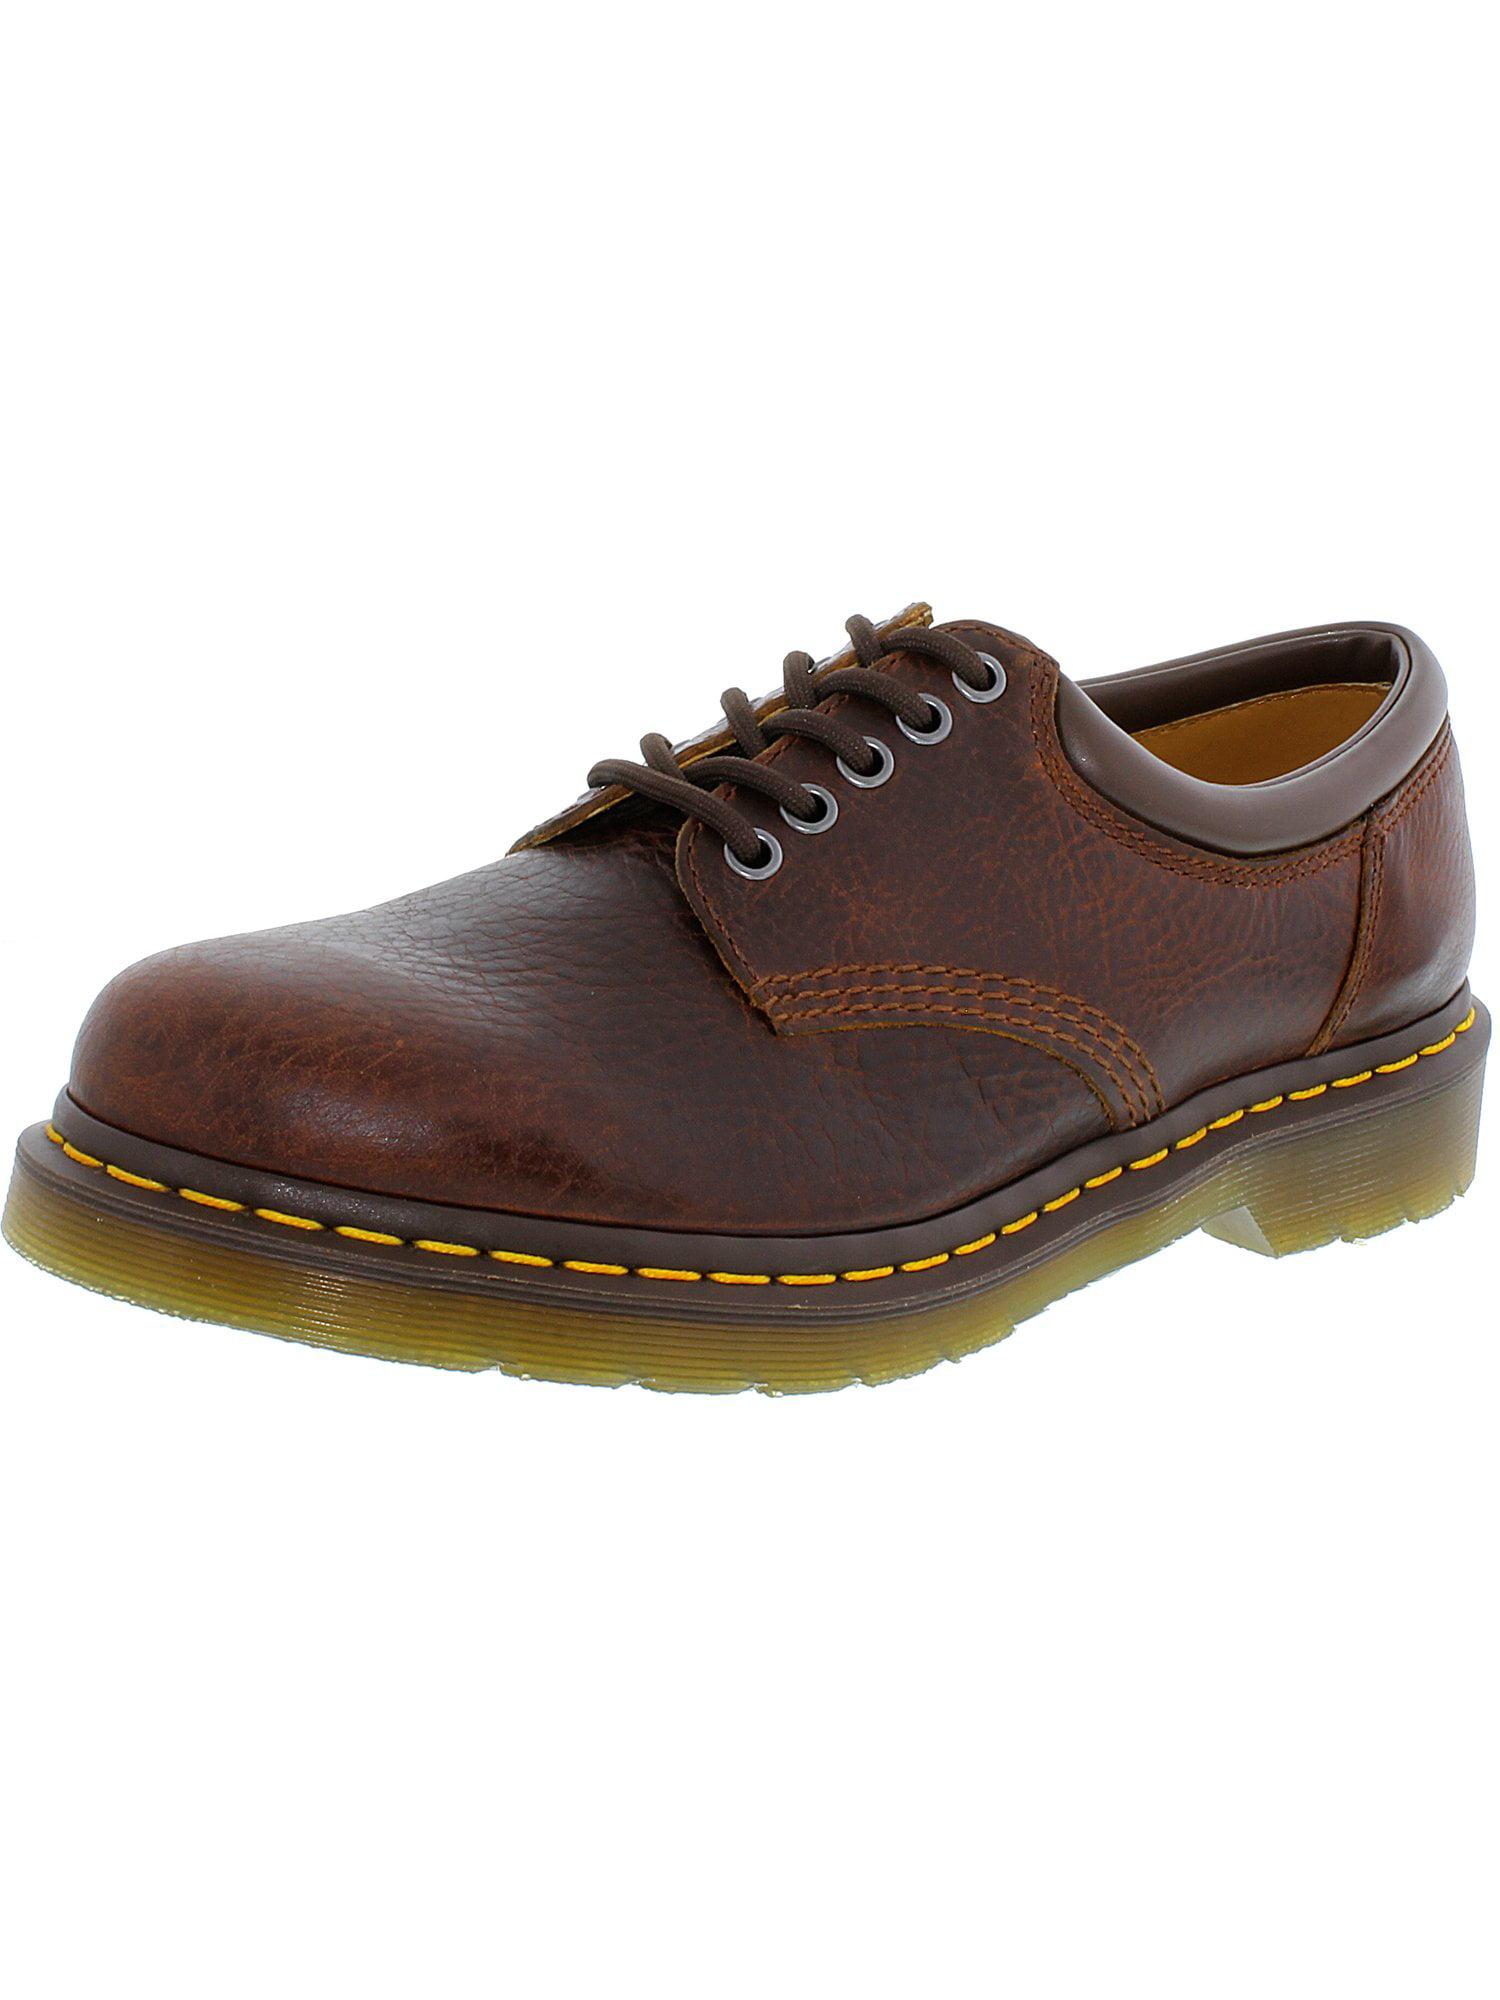 Dr. Martens Men's 8053 Lace-Up Black Ankle-High Leather Oxford Shoe 12M by Dr. Martens